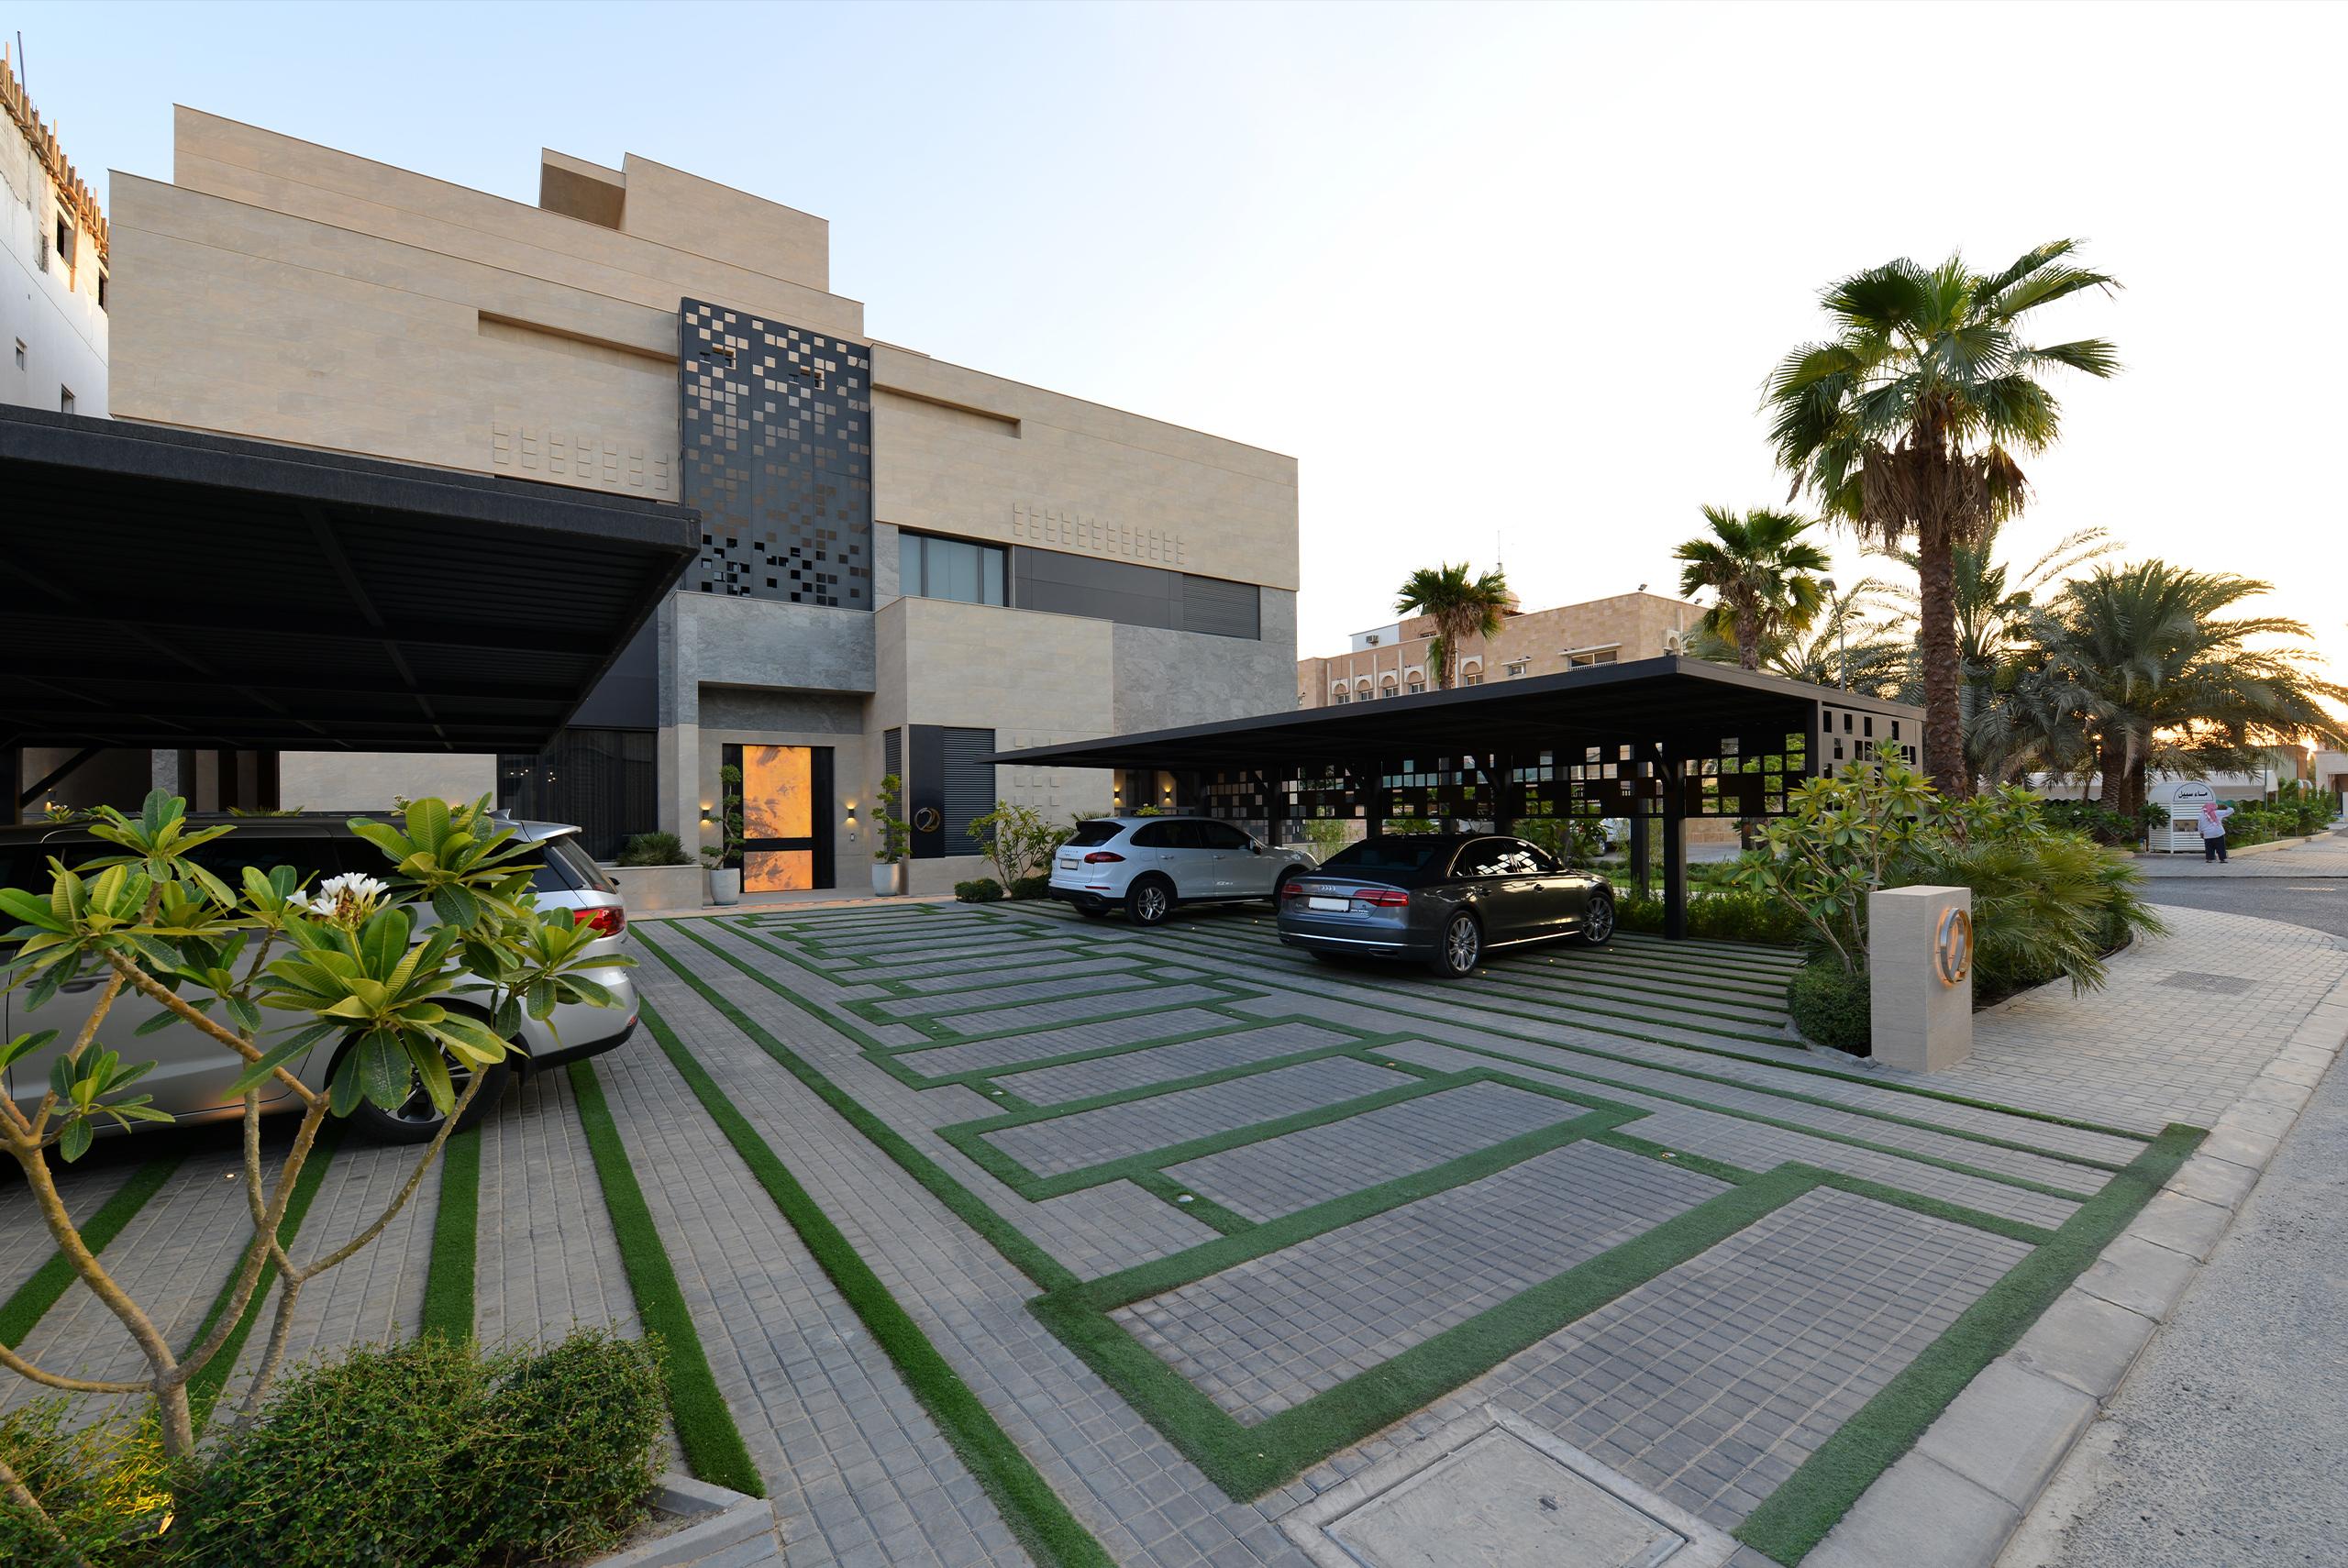 Kuwait City, Kuwait – «Al-Eisa» Villa privada - Oikos